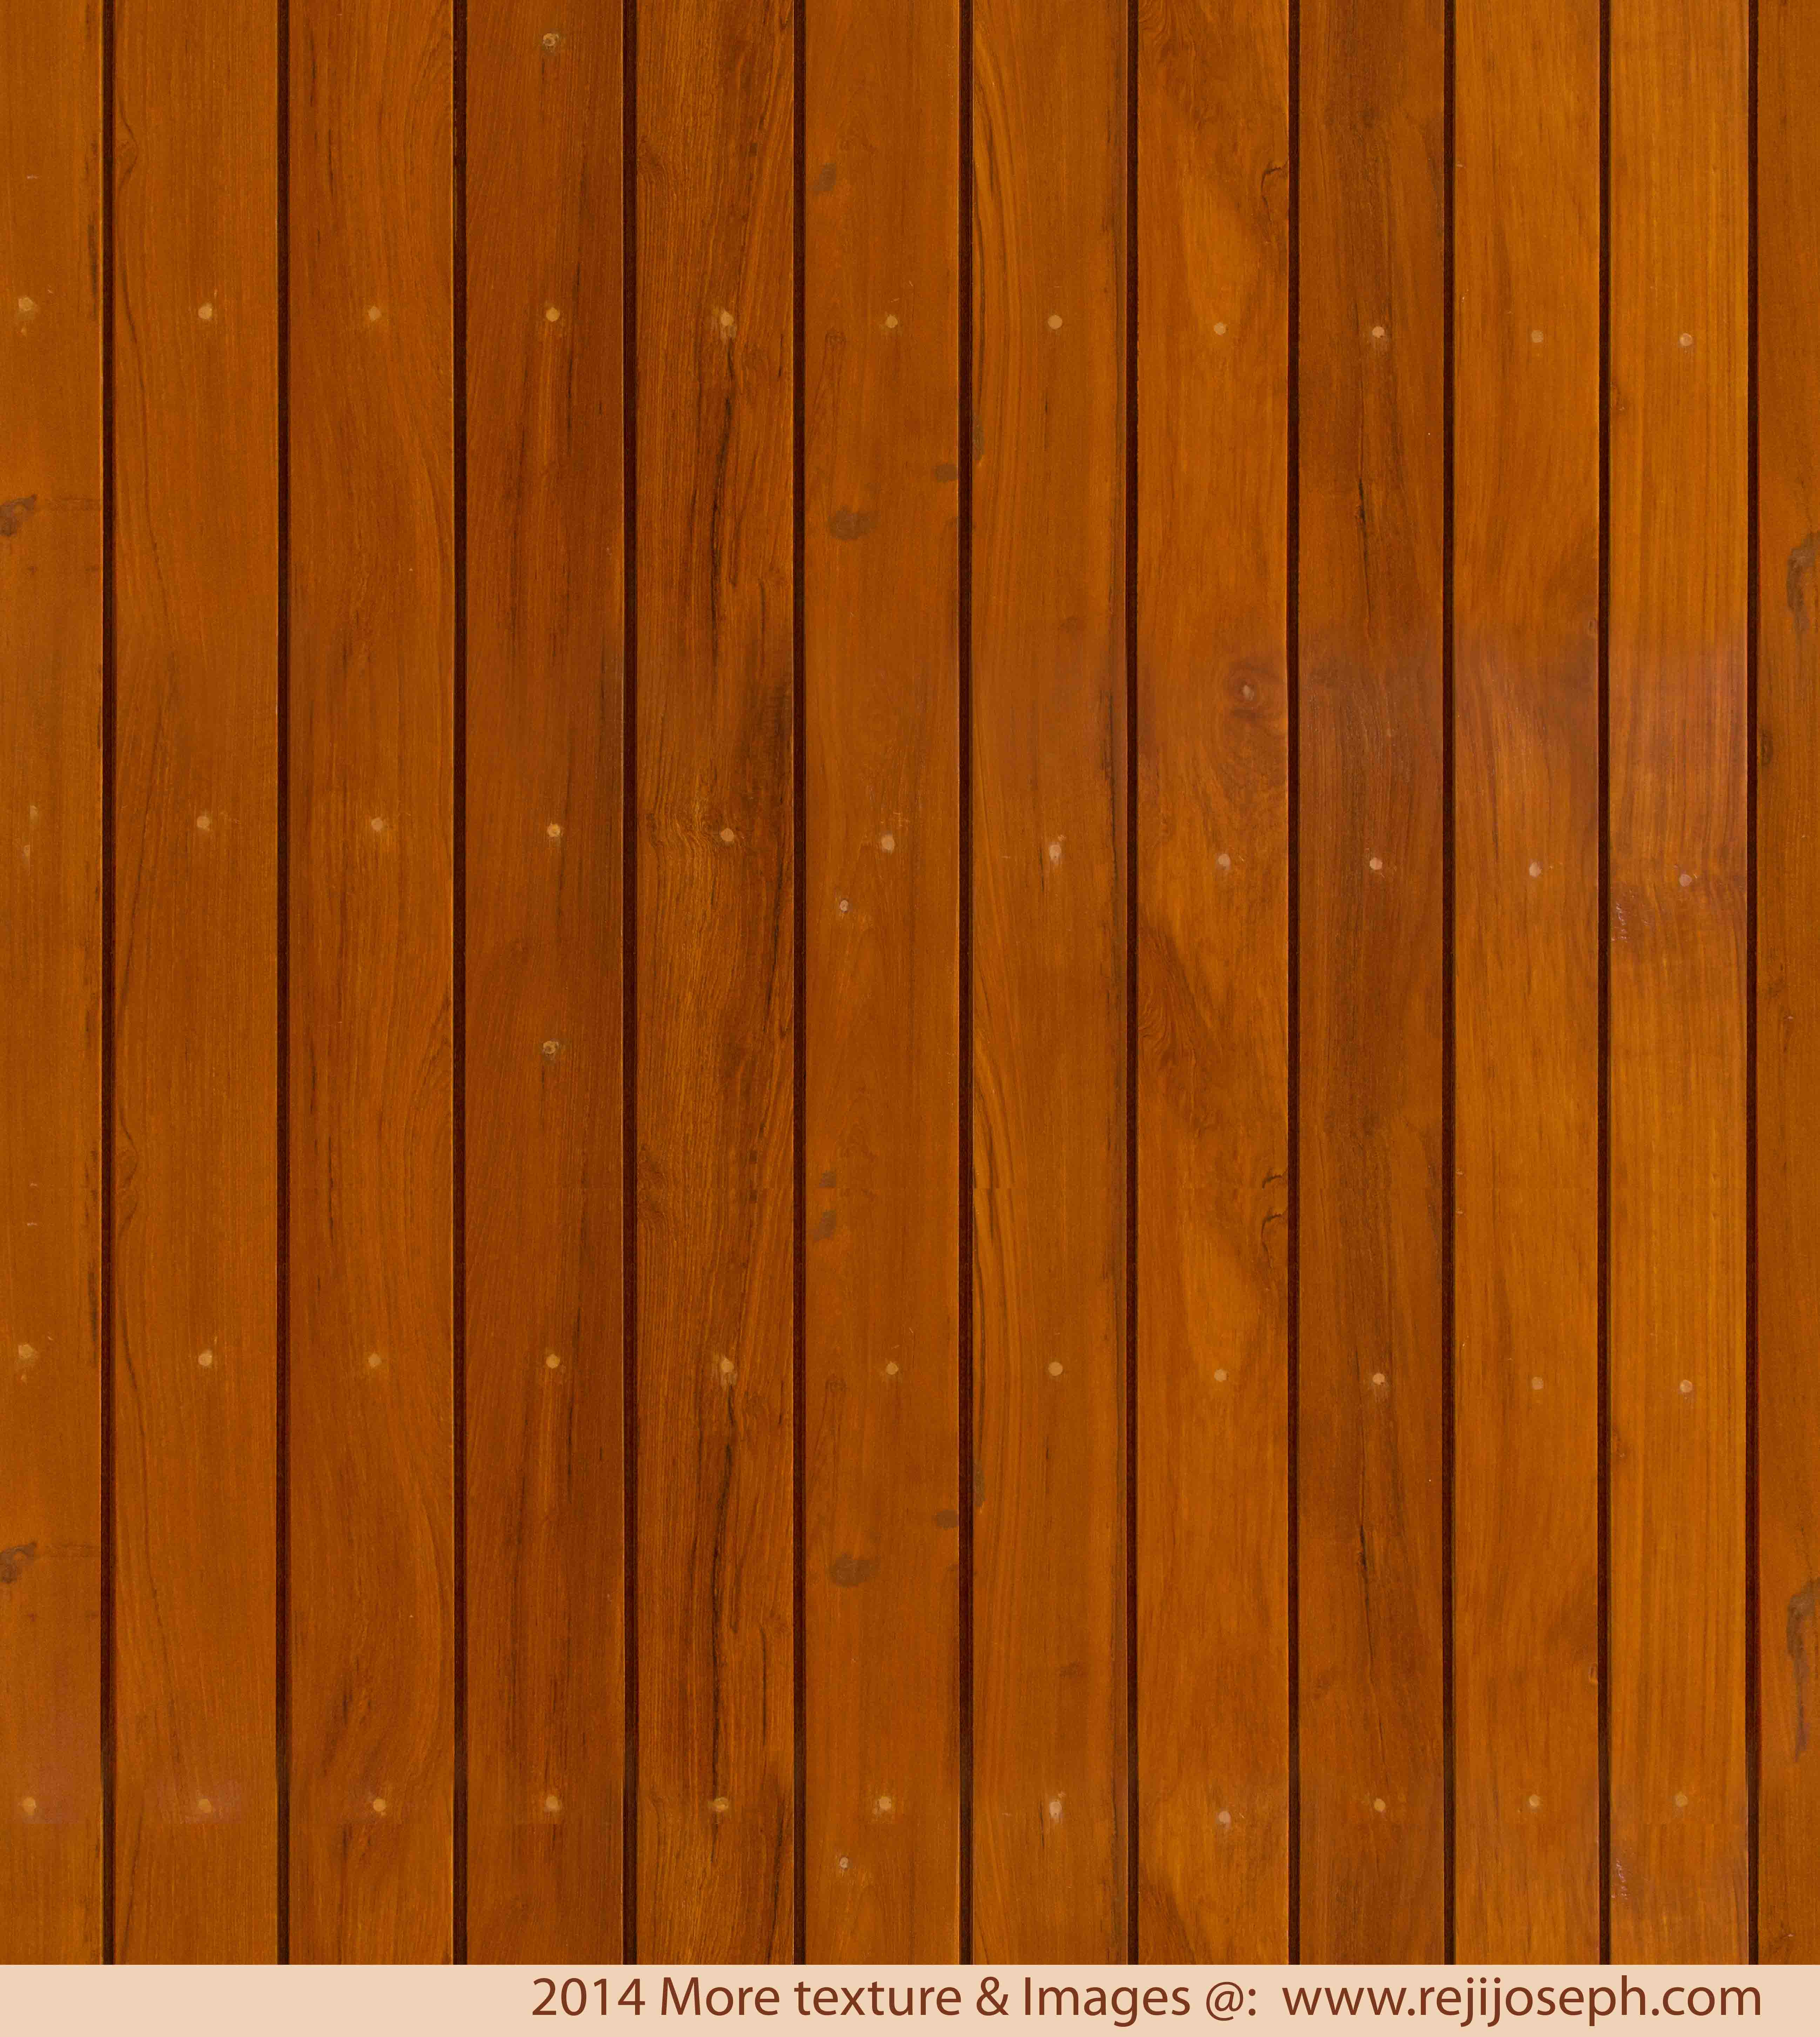 Plane Wood texture 00003